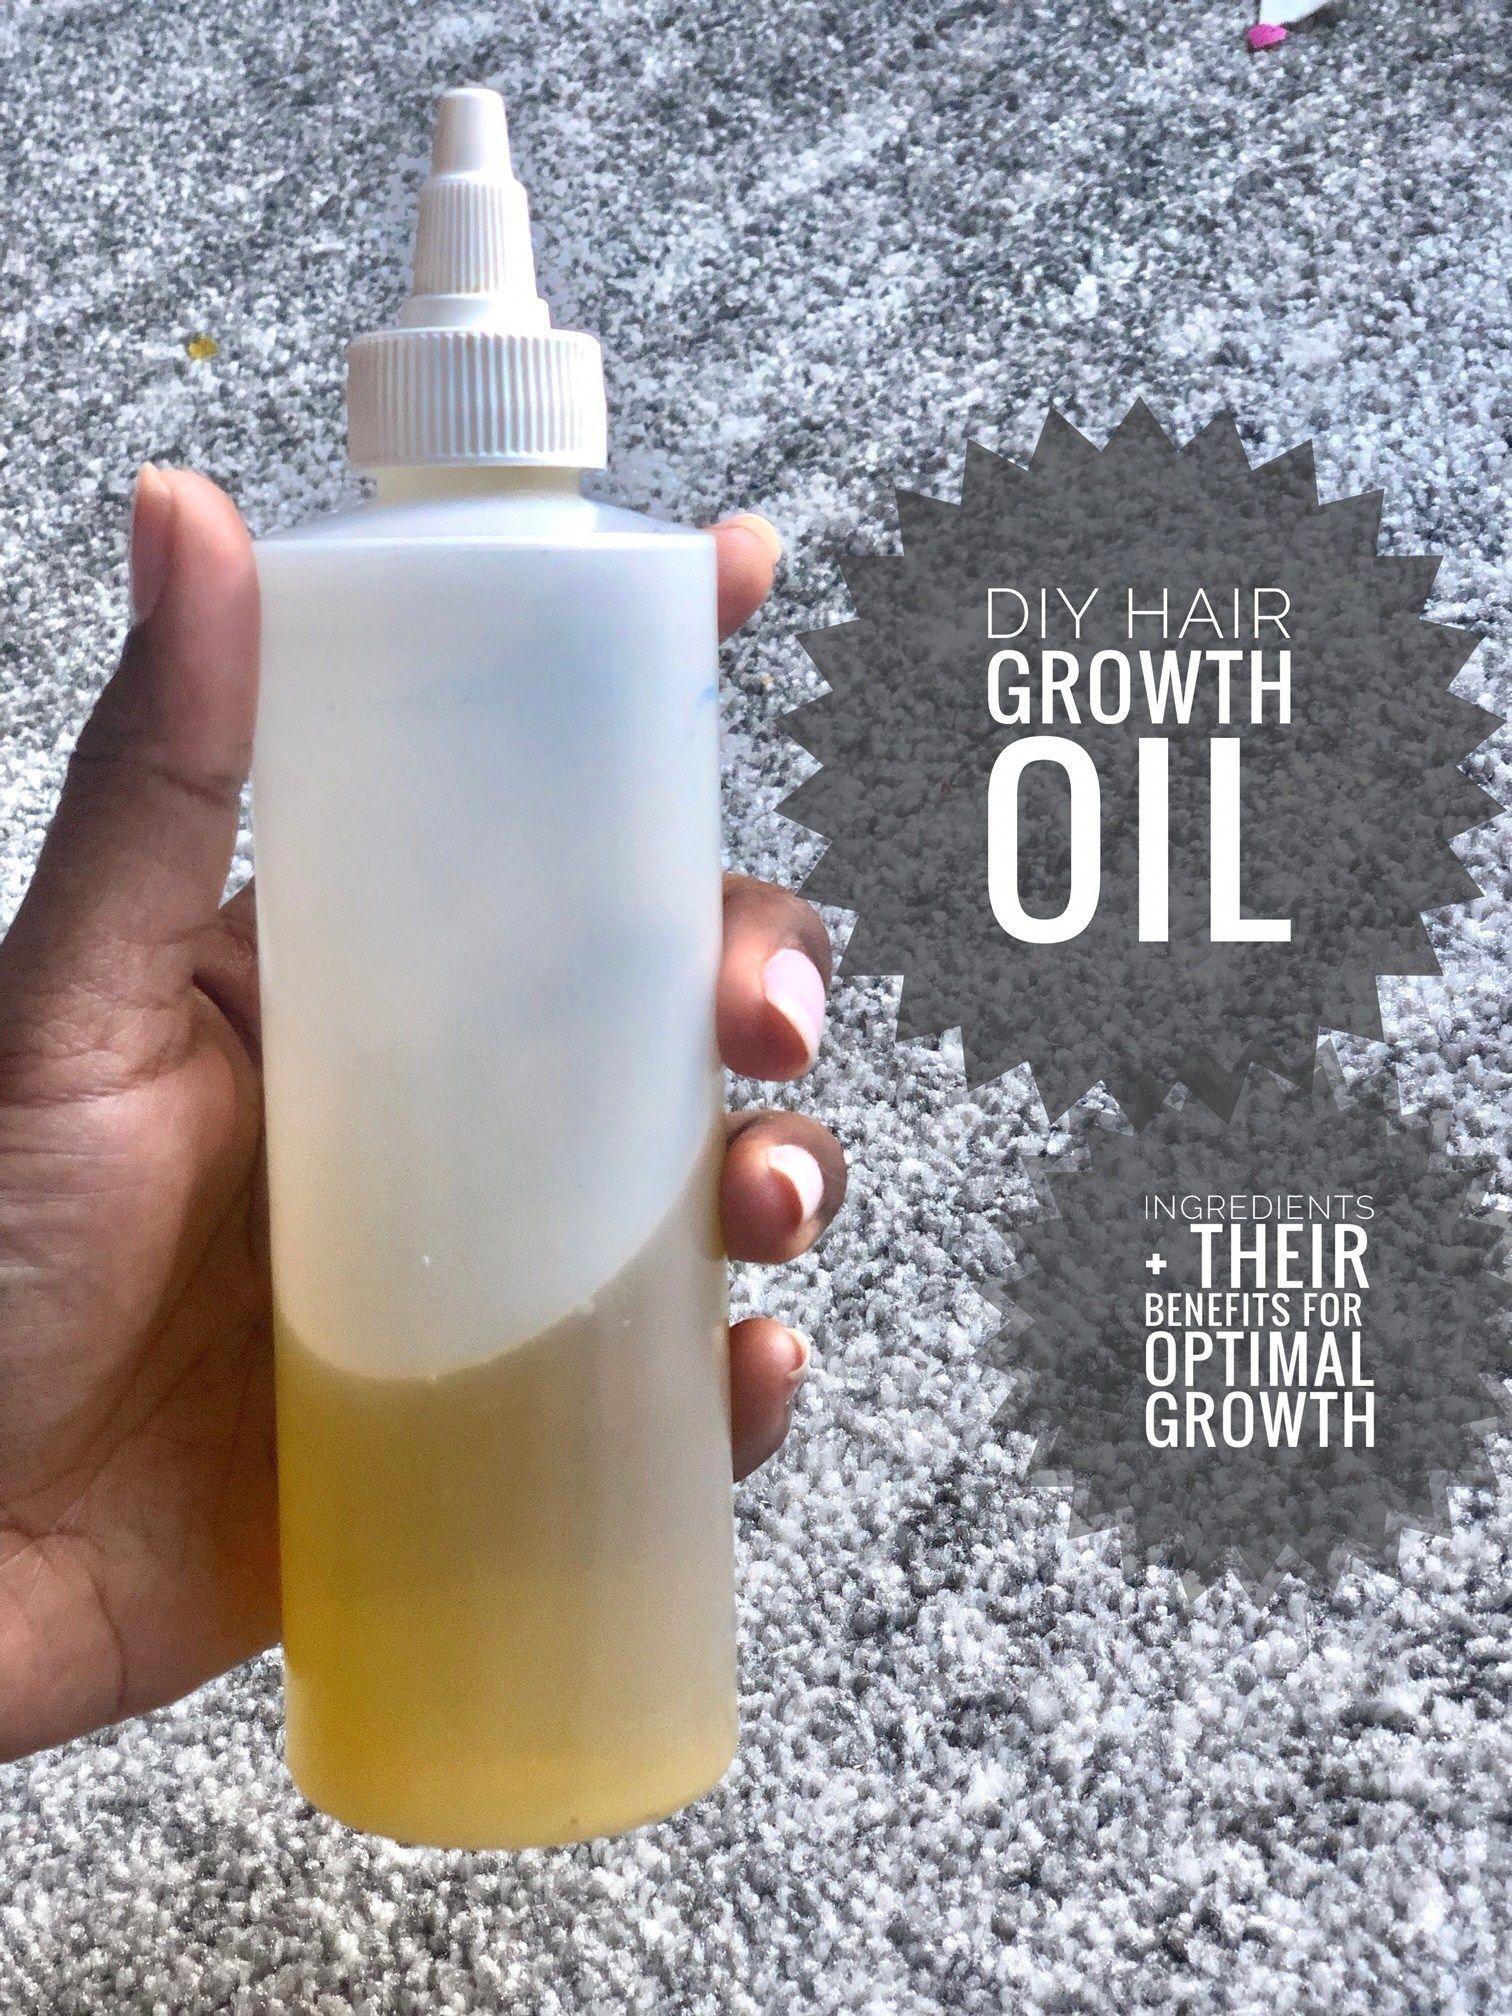 Diy hair growth oil mamas kitchen curls natural